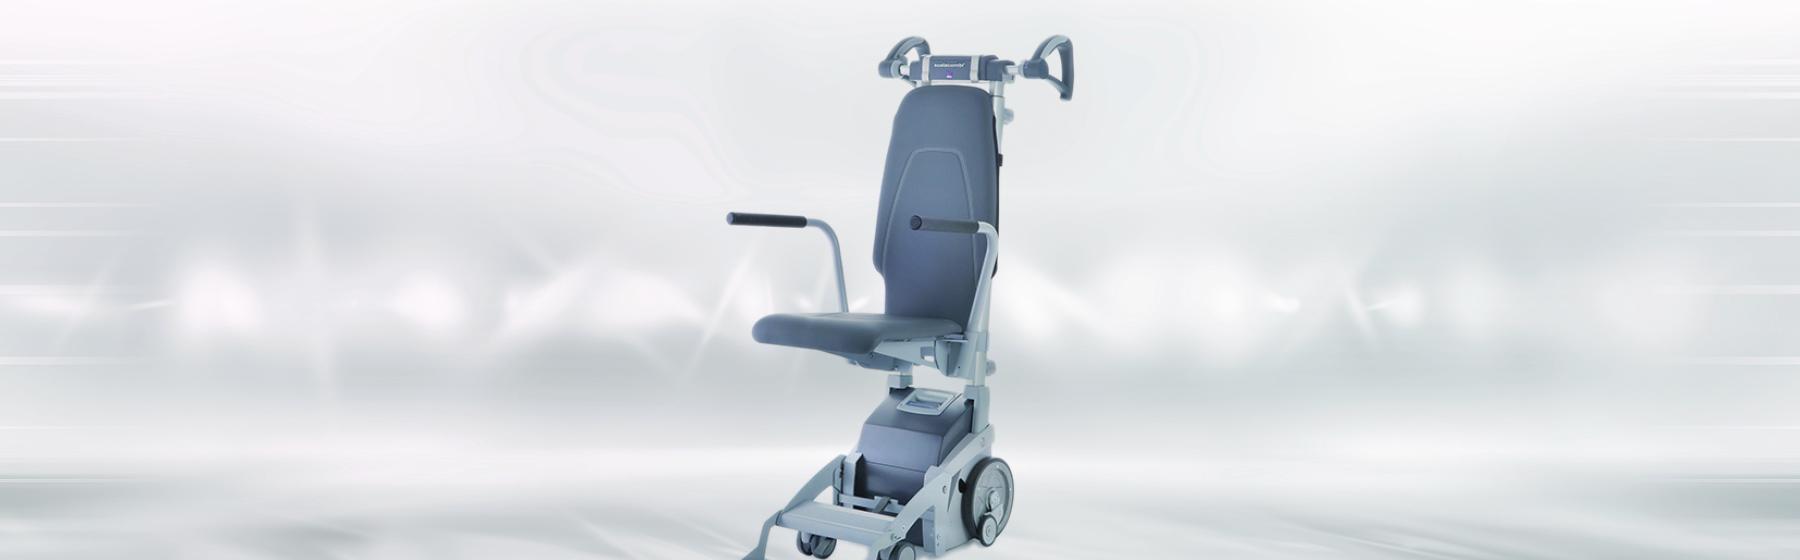 SMB-Mobilitaet-Rubrikenmotiv-Treppenhilfen